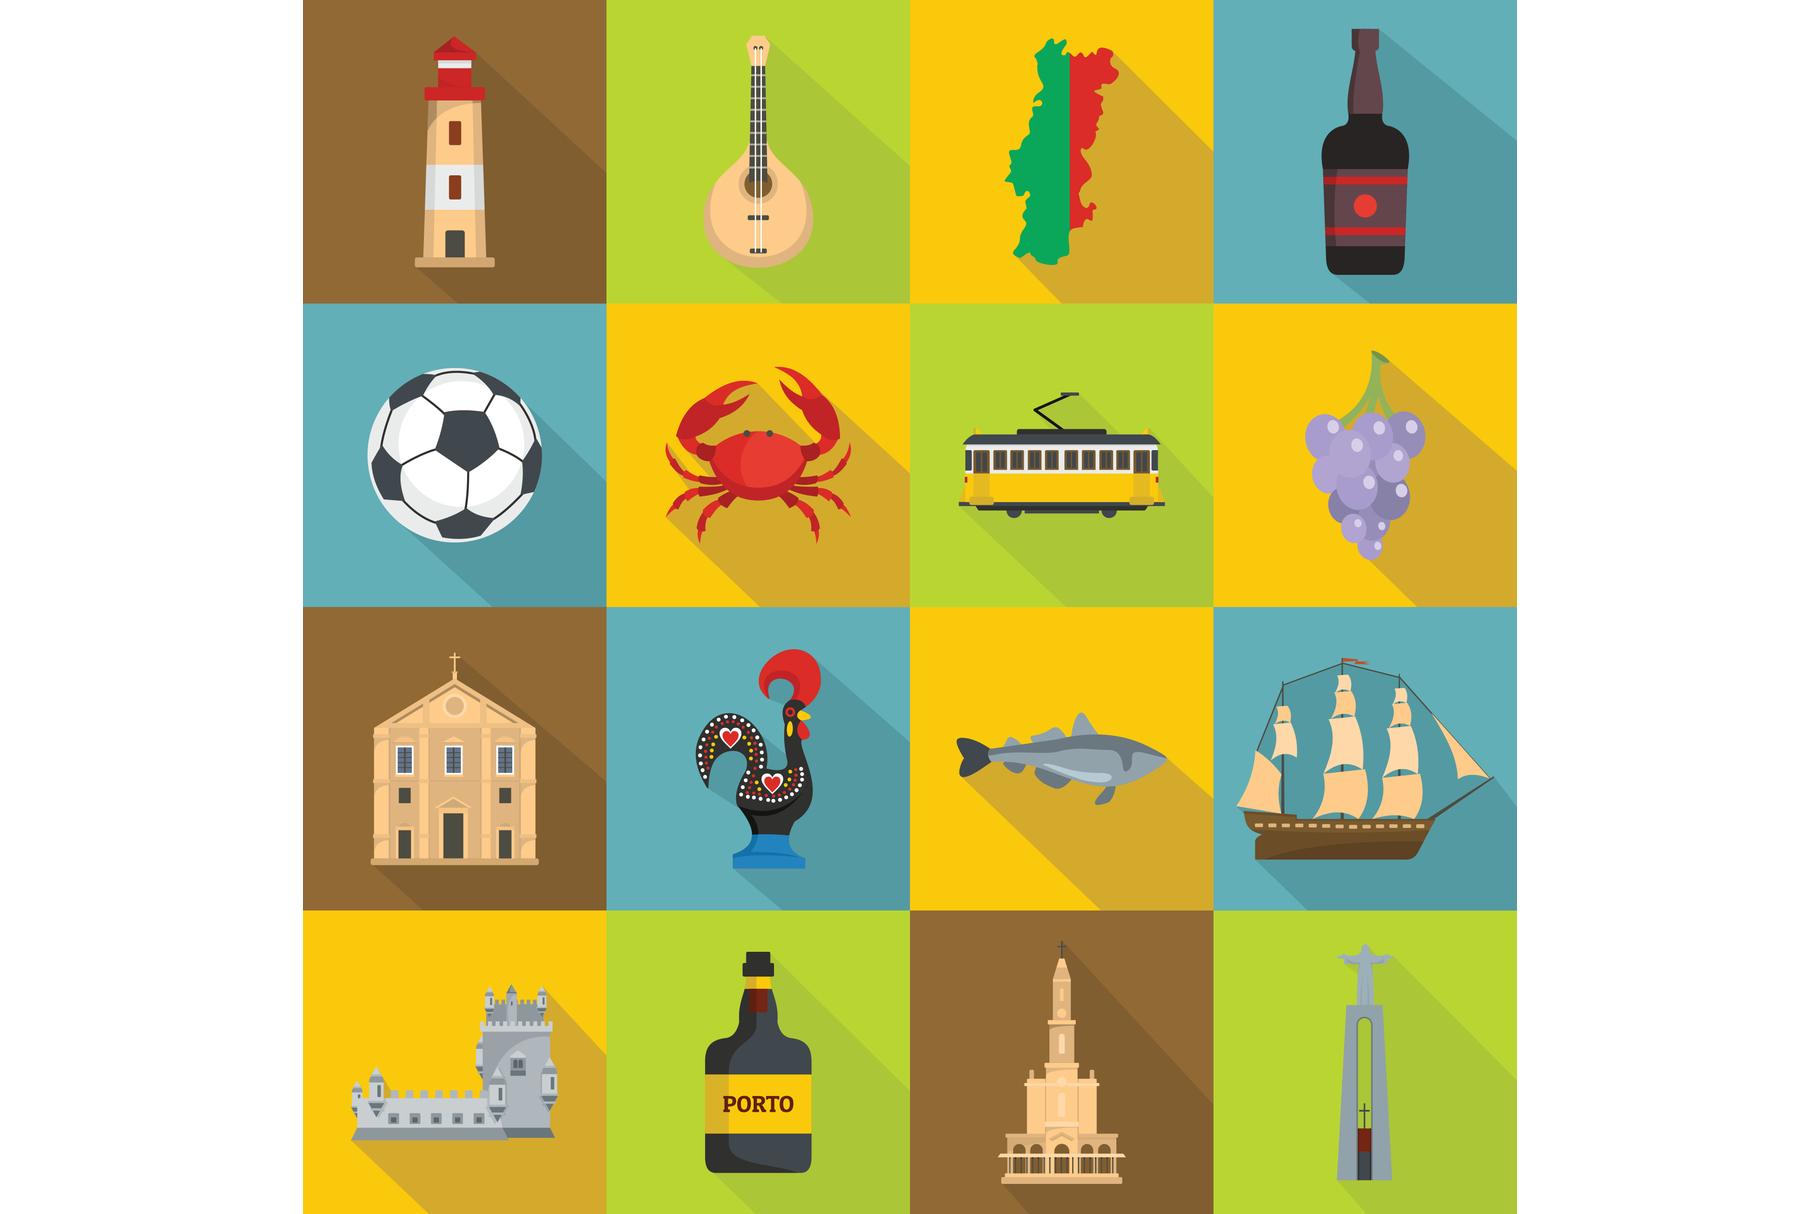 Portugal travel icons set, flat style example image 1